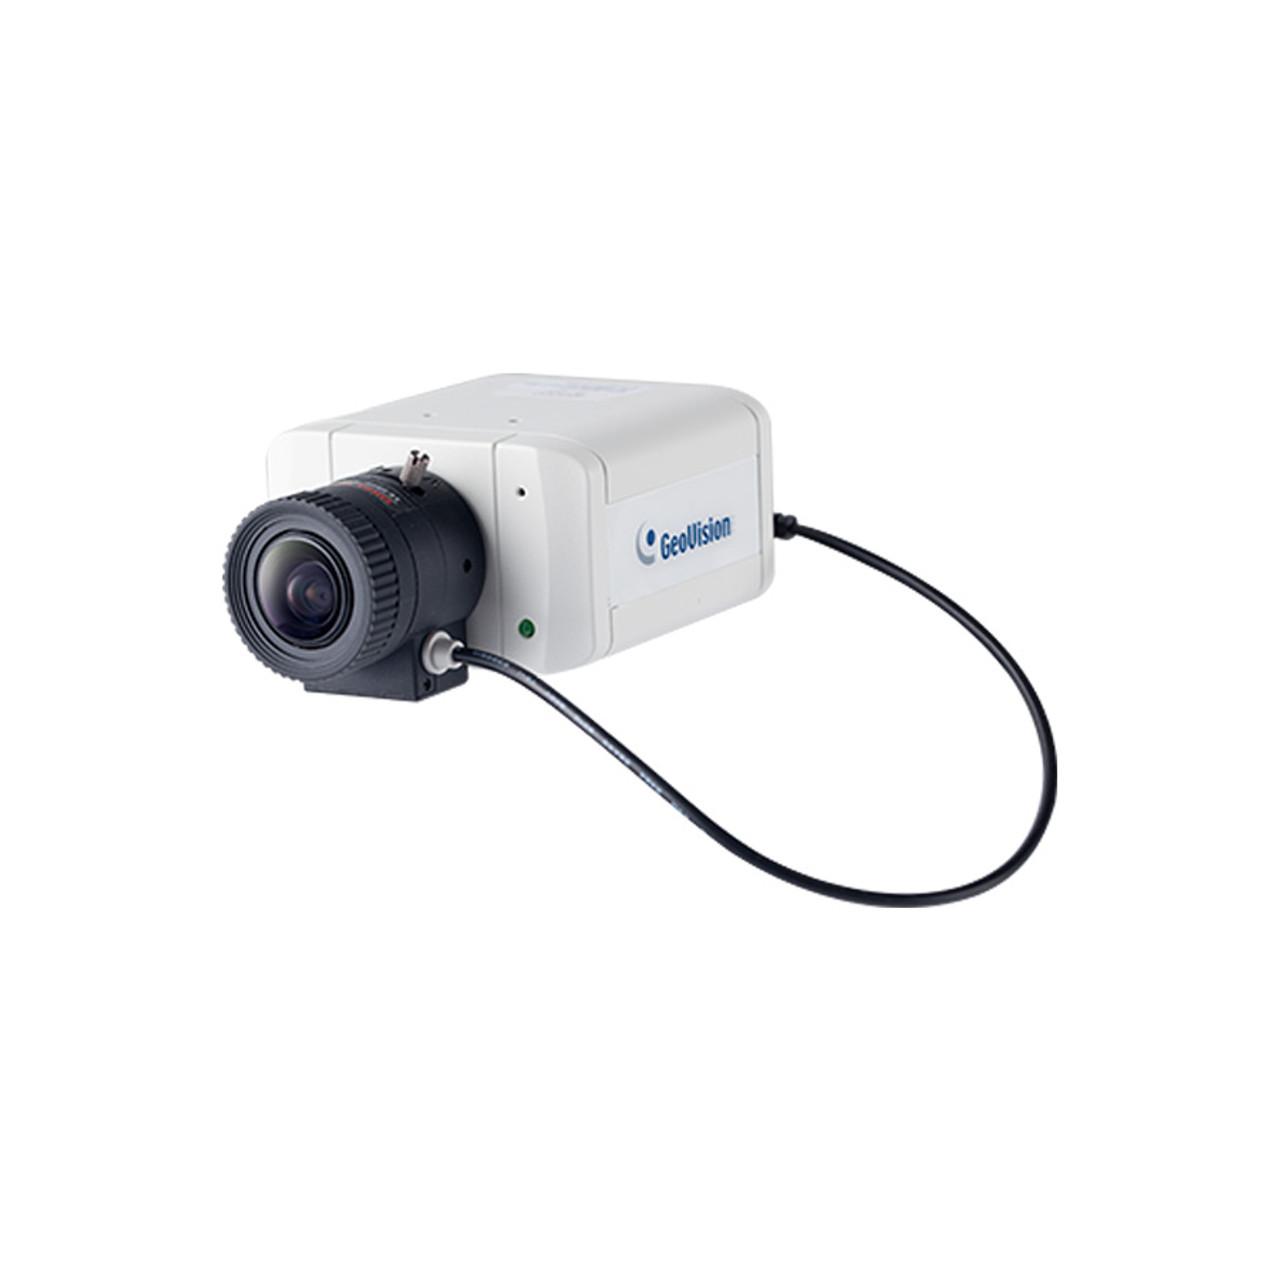 Geovision GV-BX2700-8F 2MP H 265 Indoor Fixed Box IP Security Camera